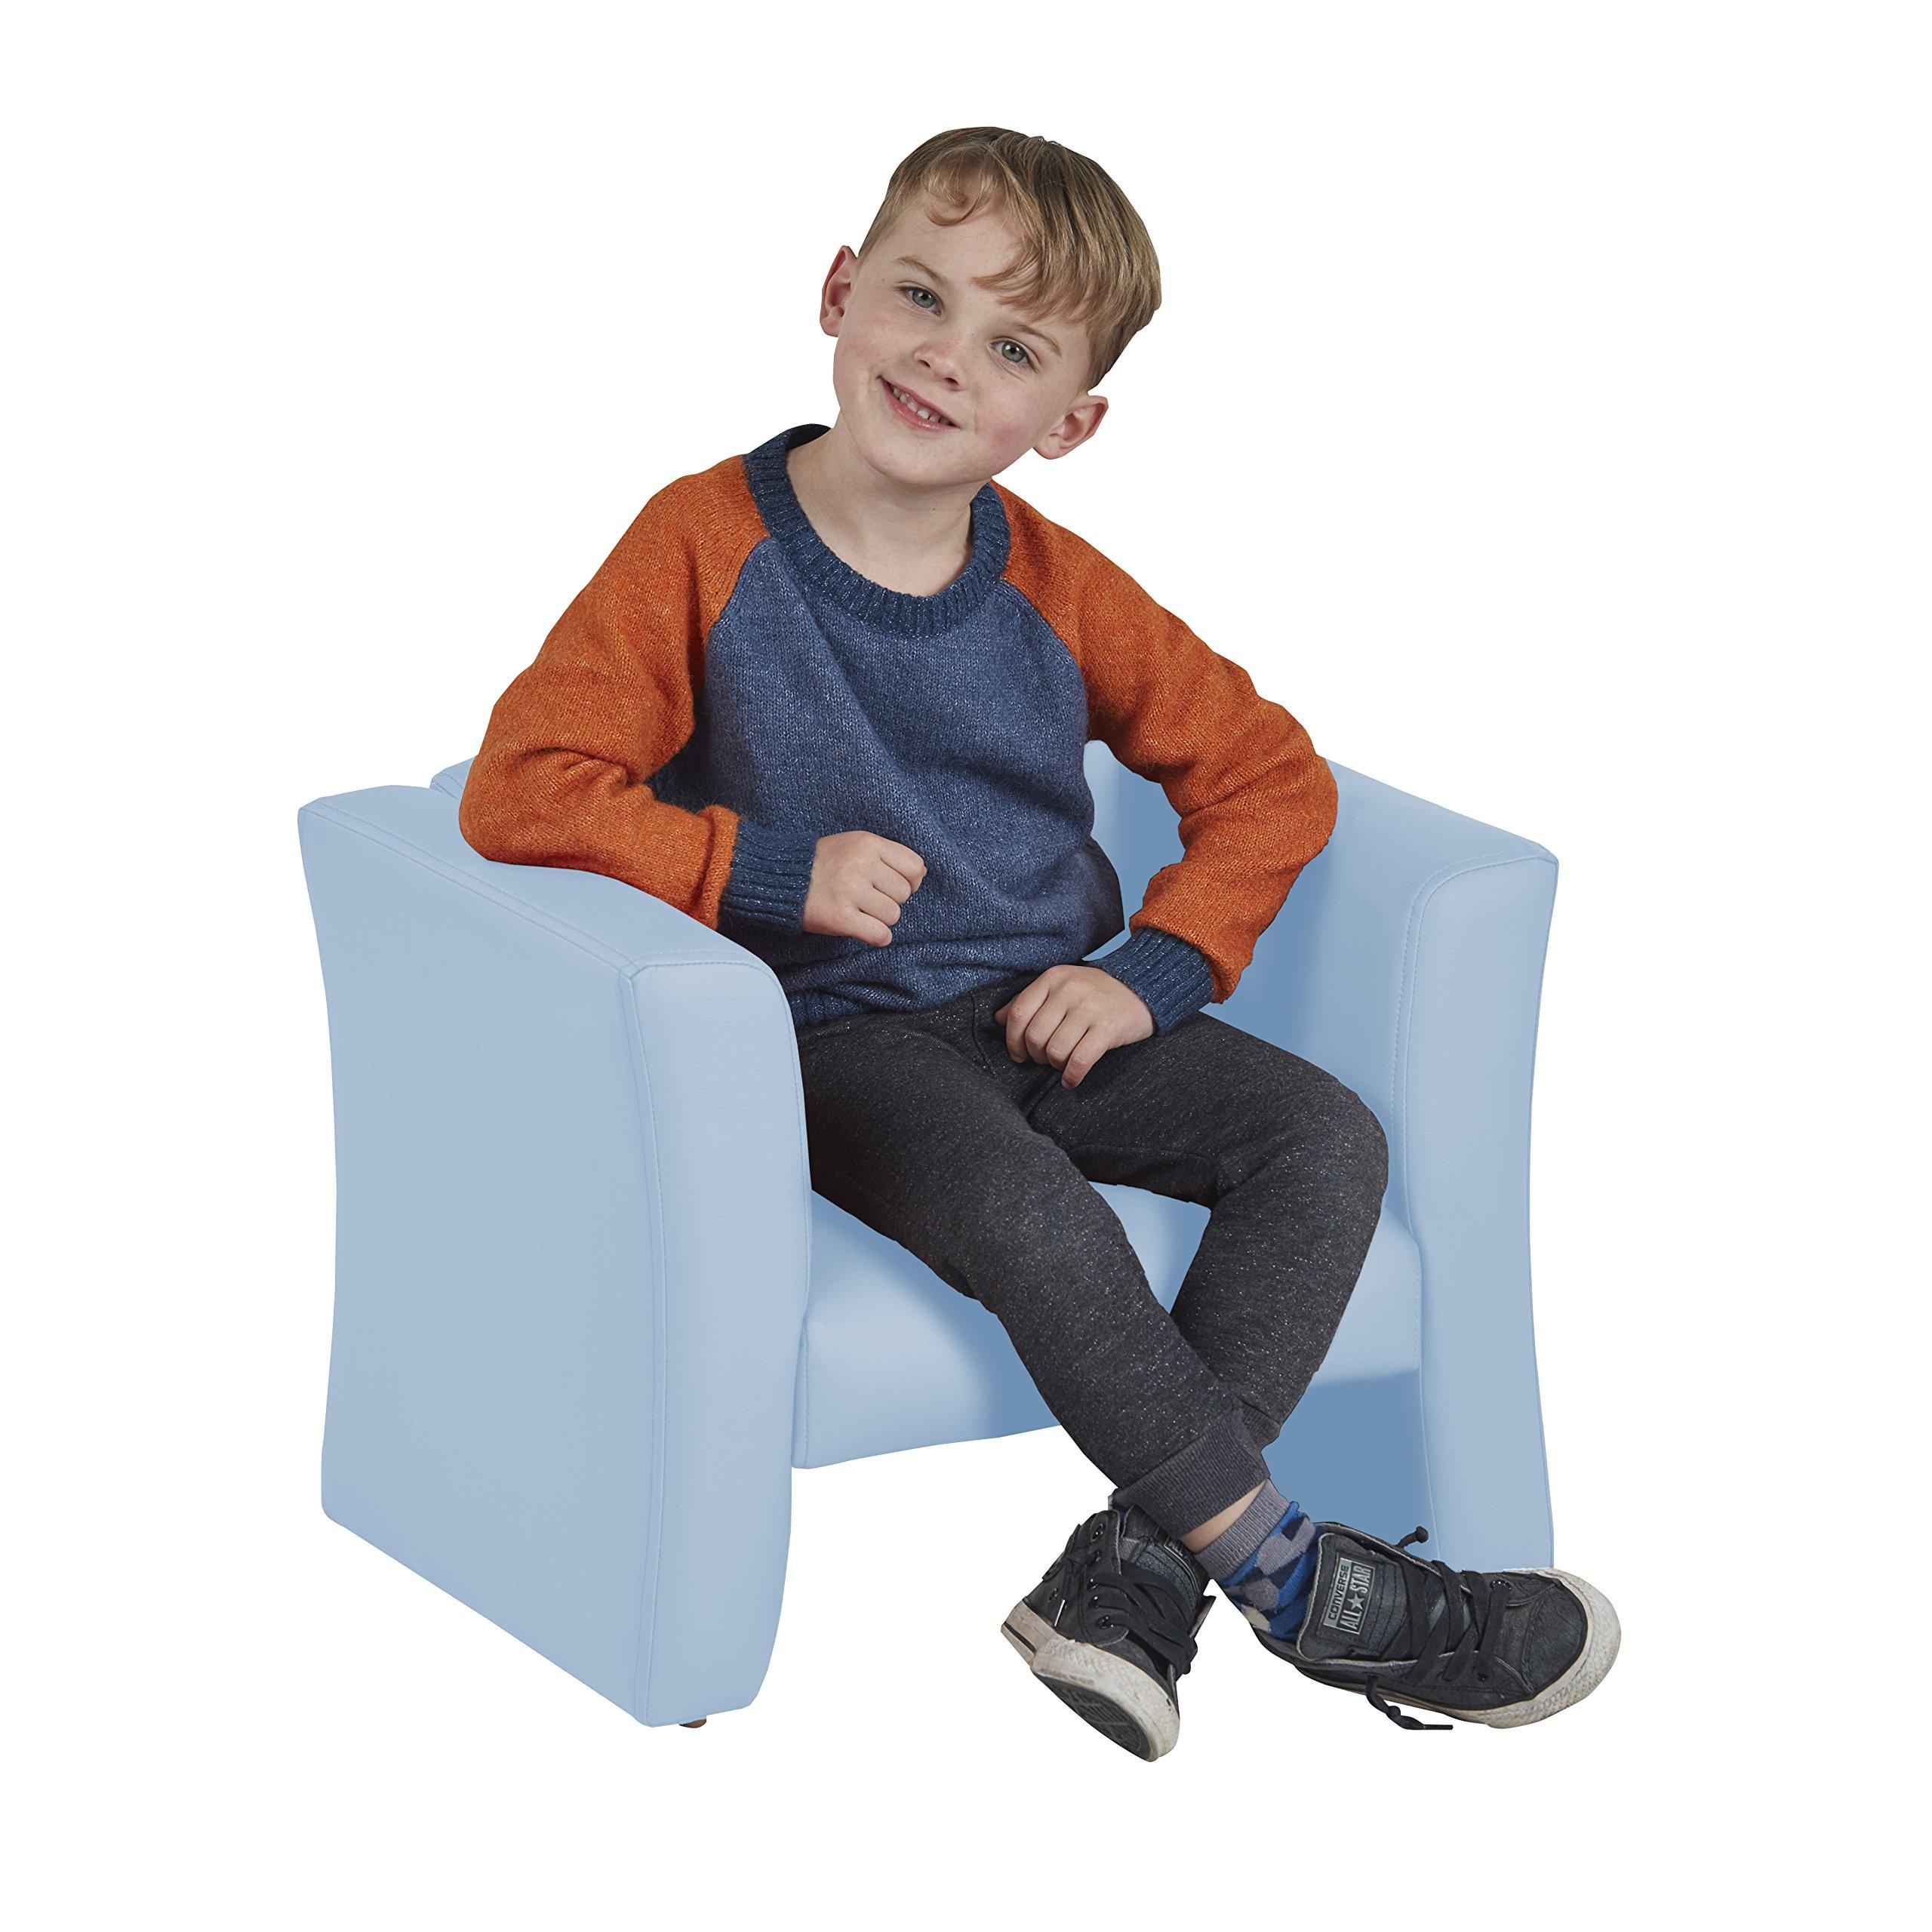 ECR4Kids SoftZone Gum Drop Upholstered Chair for Kids - Daycare, Homeschool, Classroom Furniture, Home Decor - Powder Blue